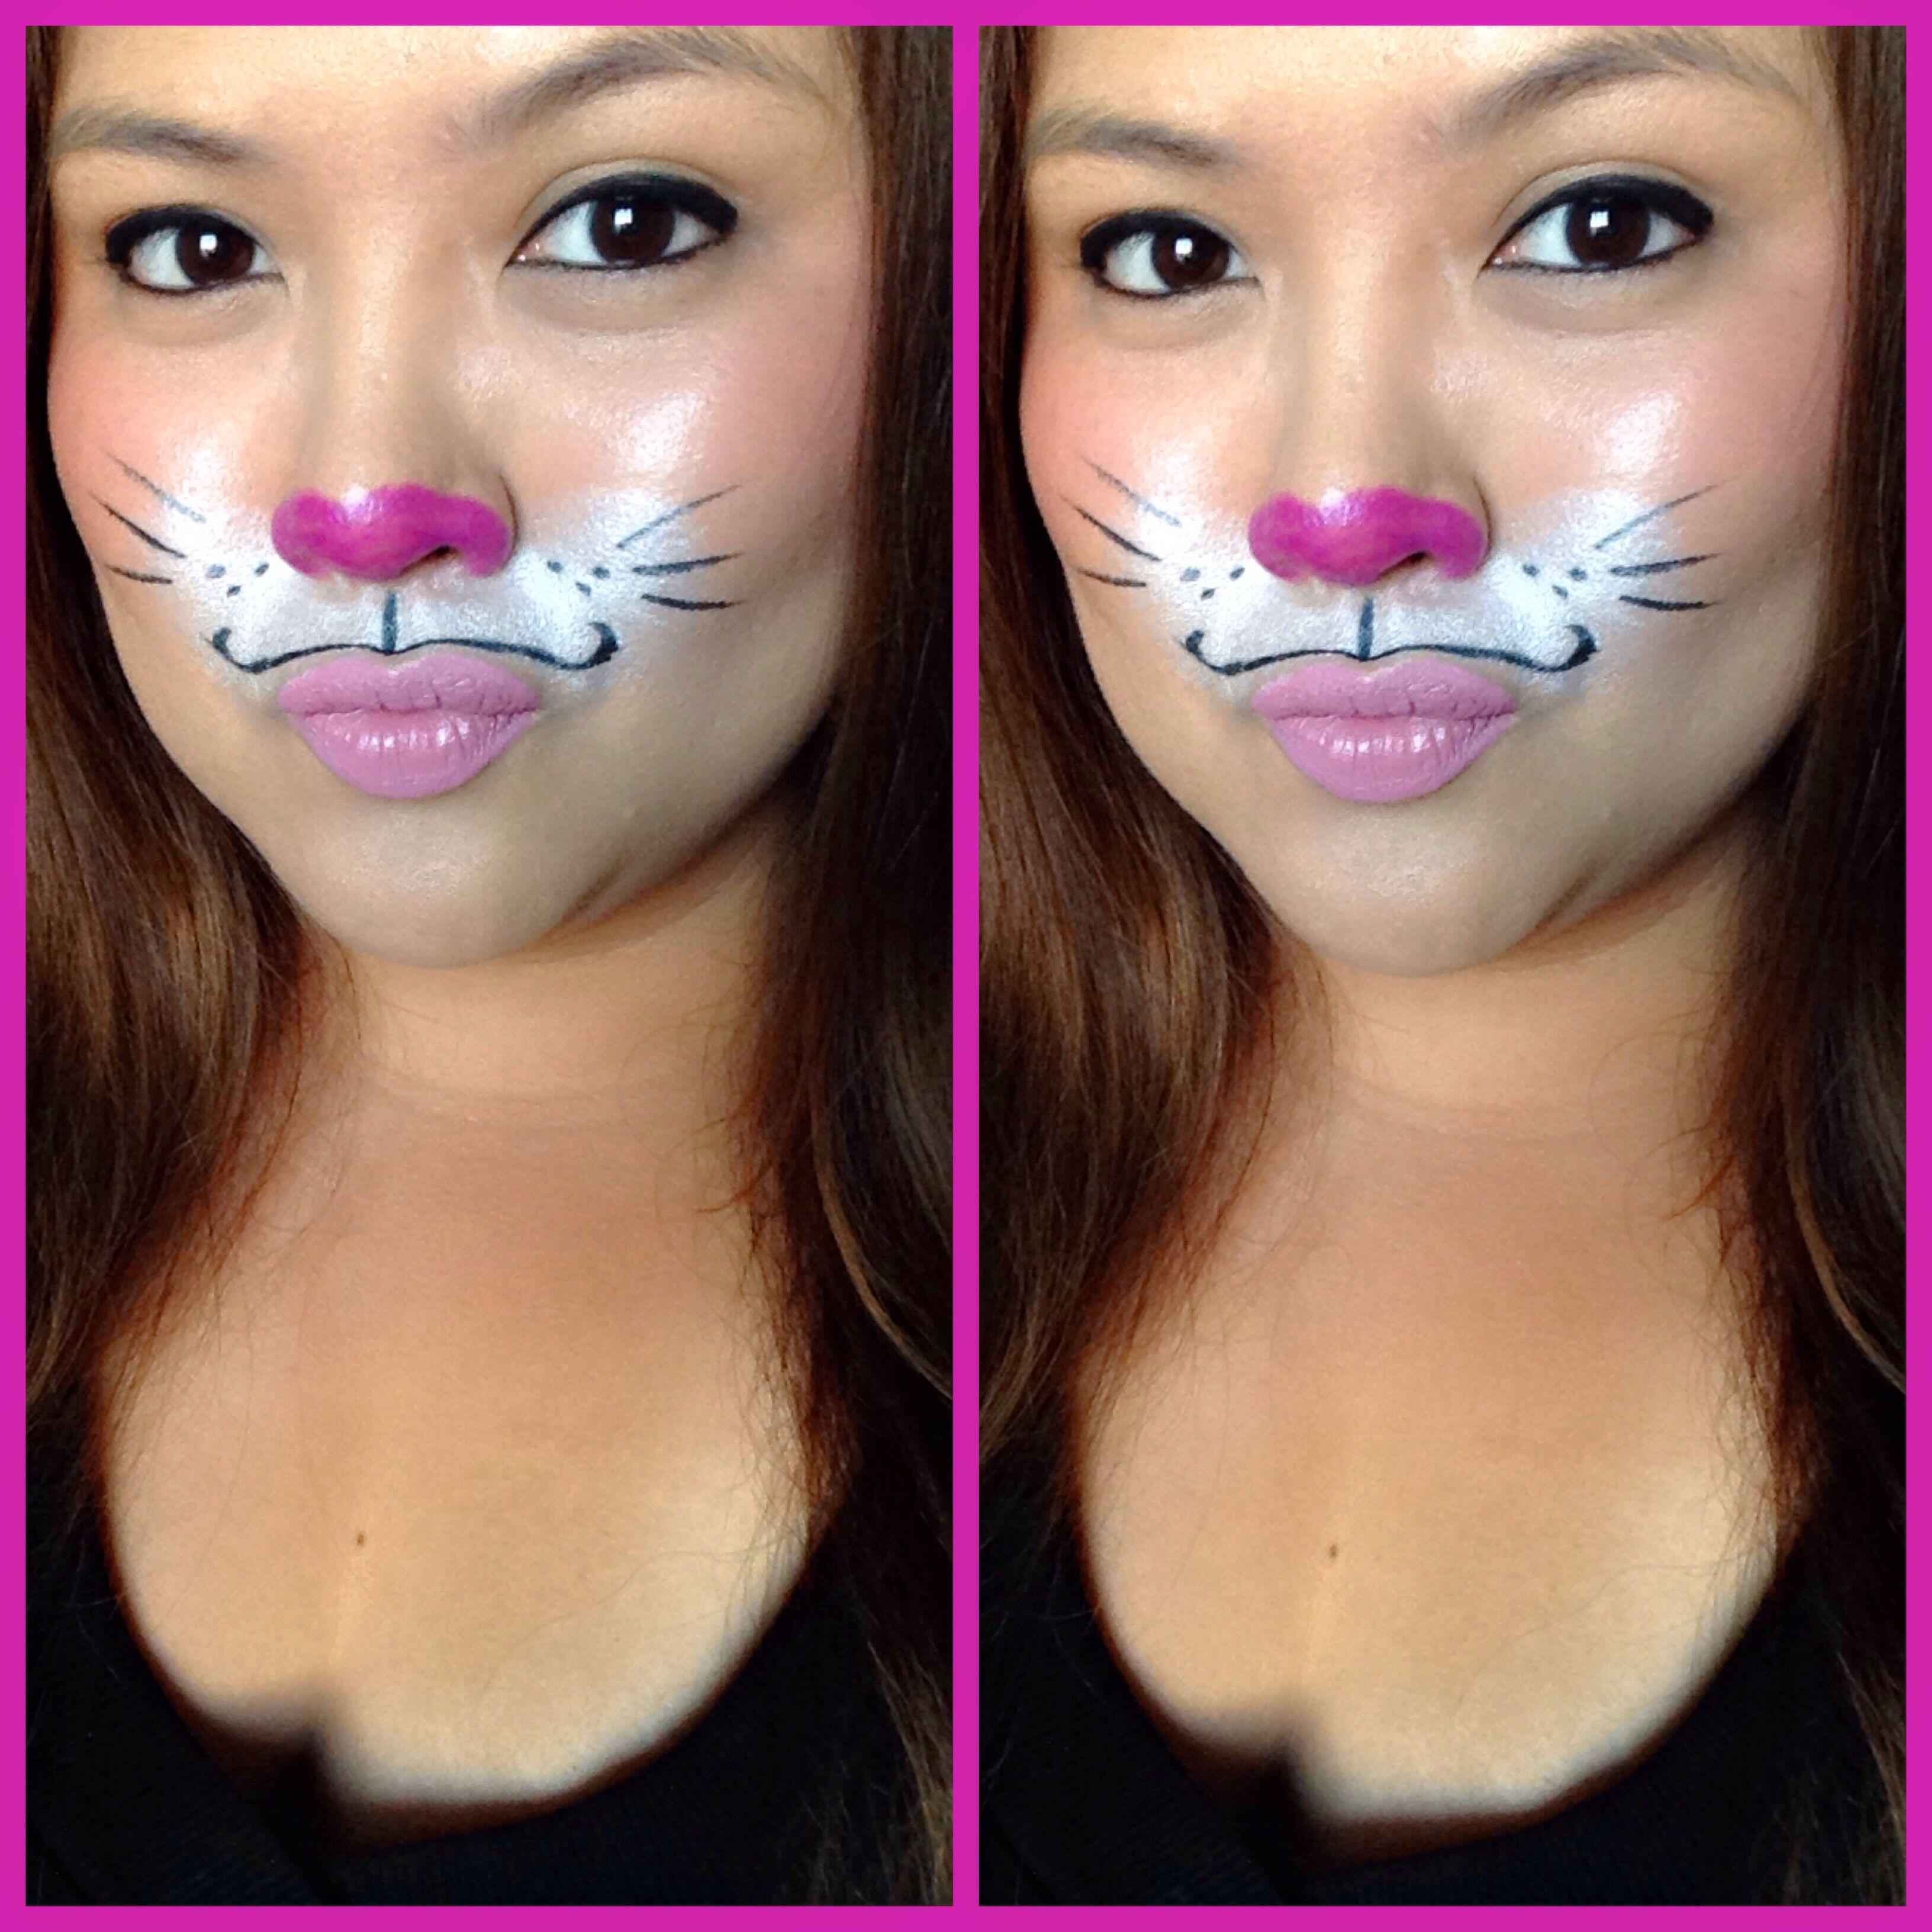 Worksheet. maquillaje para disfraz de 3conejita de pascua guapa al instante